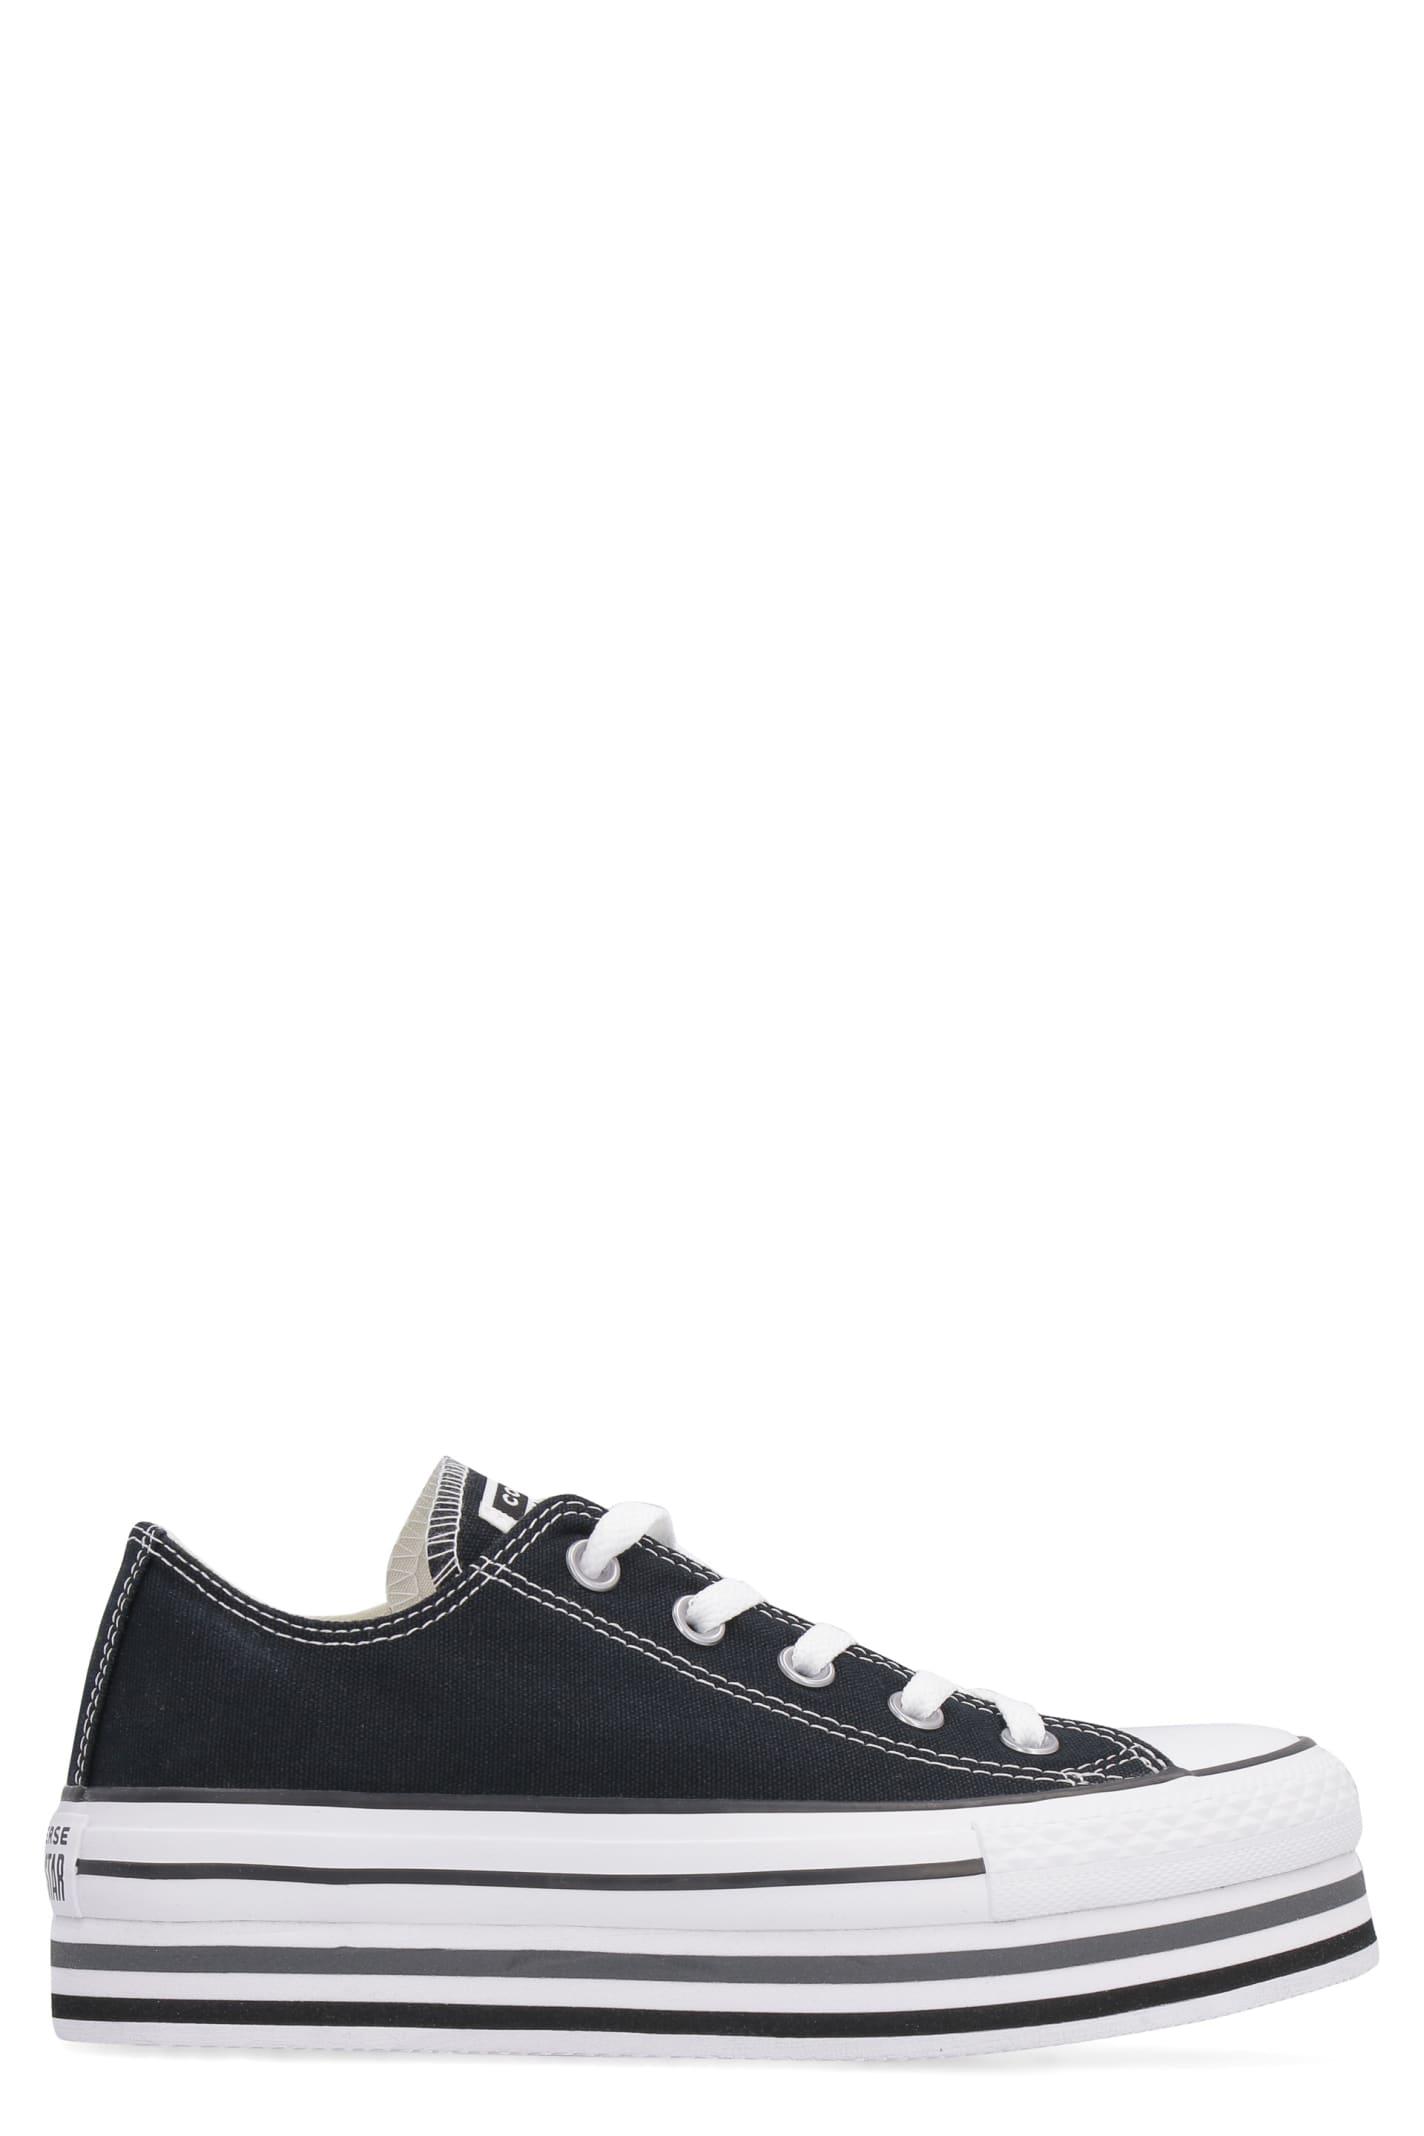 platform sneakers converse